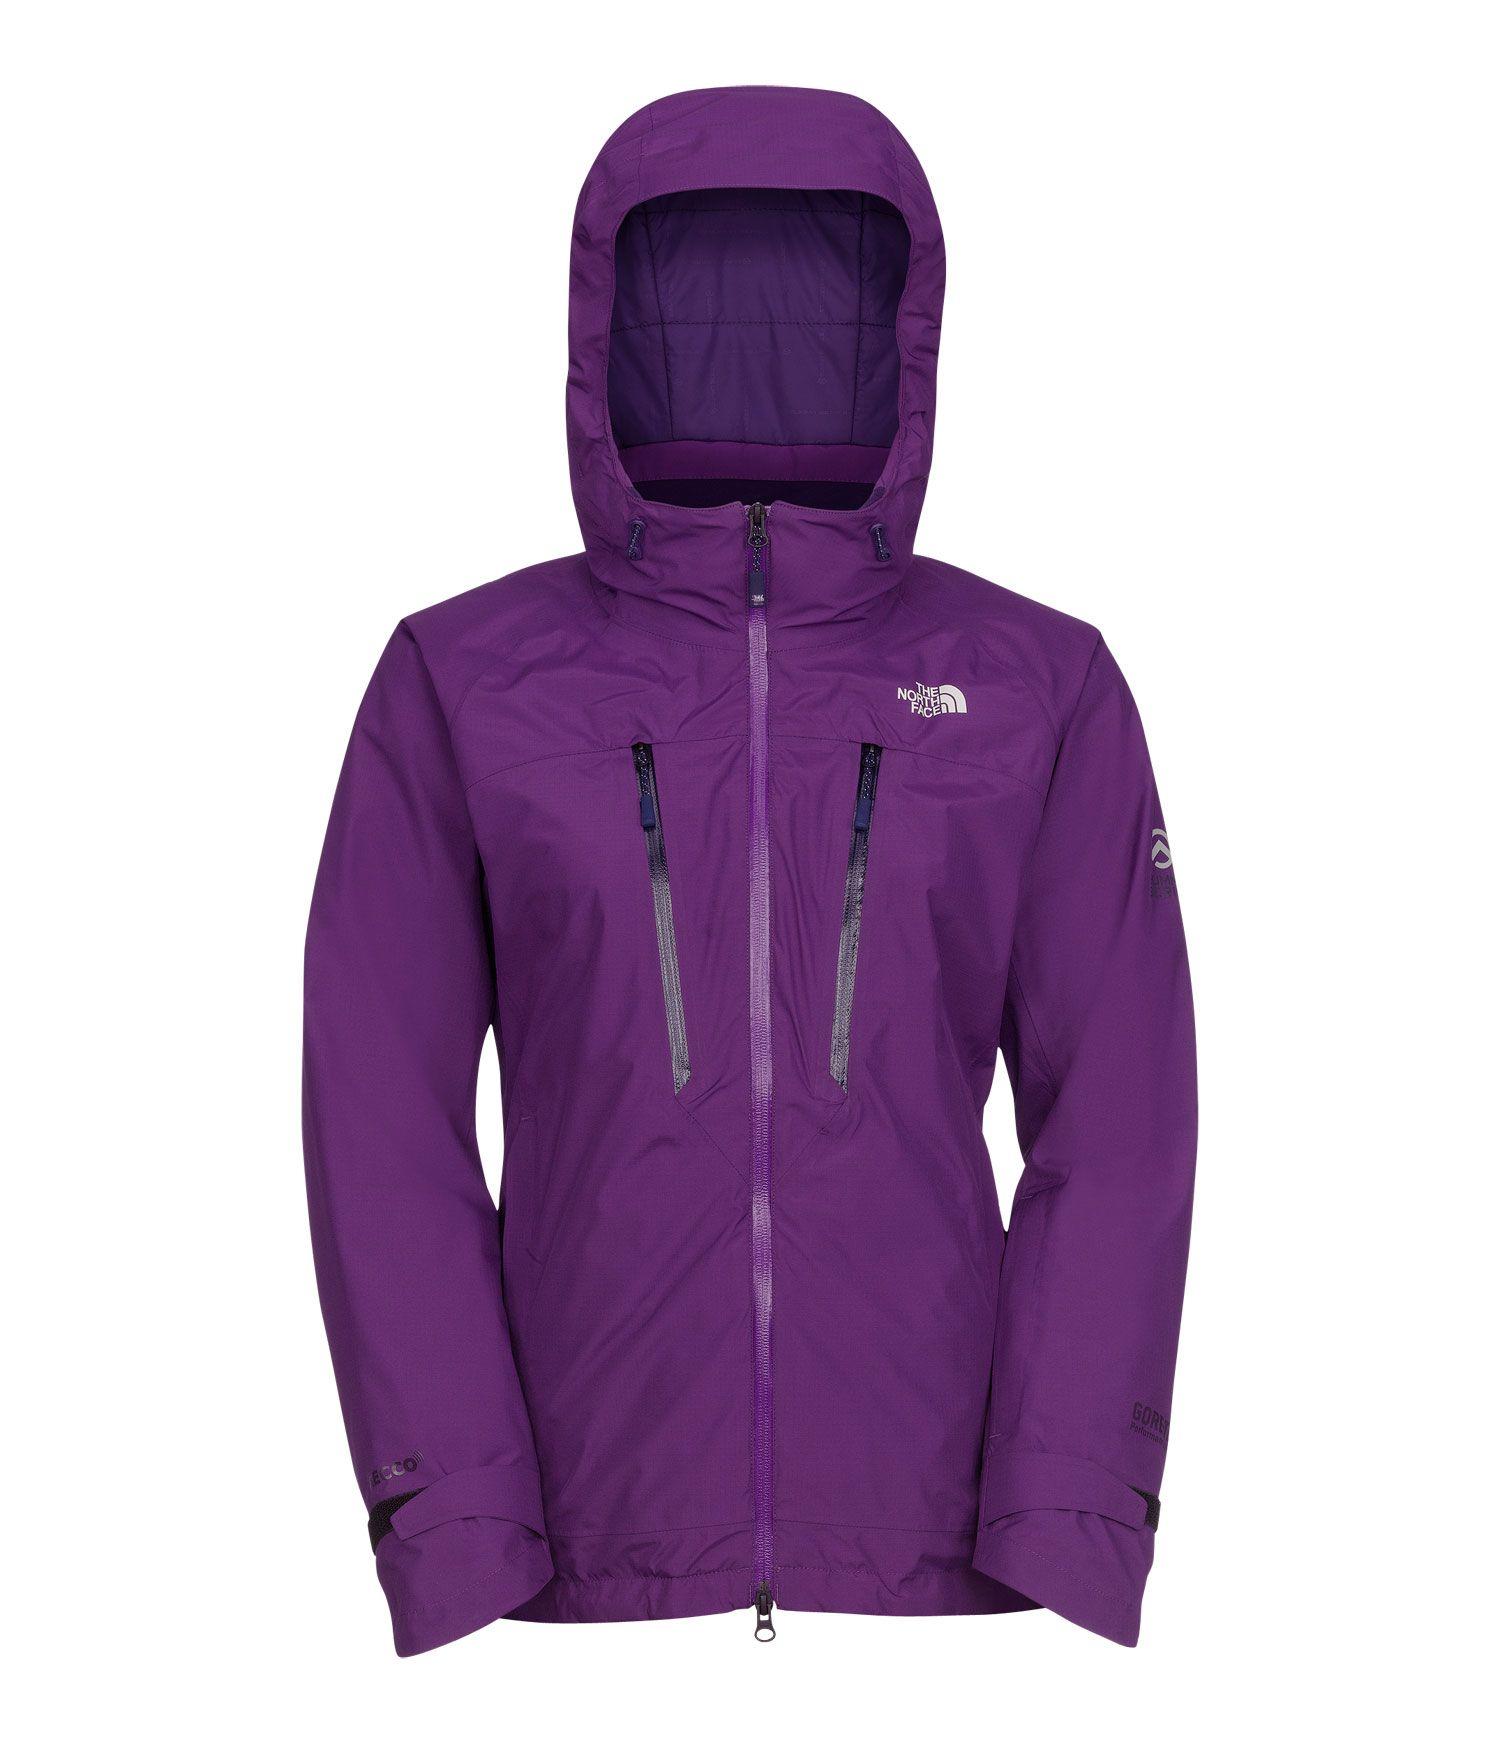 The North Face Elemot Ski Jacket Gravity Purple Perfect For Snowboarding 33 Ski Jacket Women Ski Jacket North Face Ski Jacket [ 1744 x 1500 Pixel ]